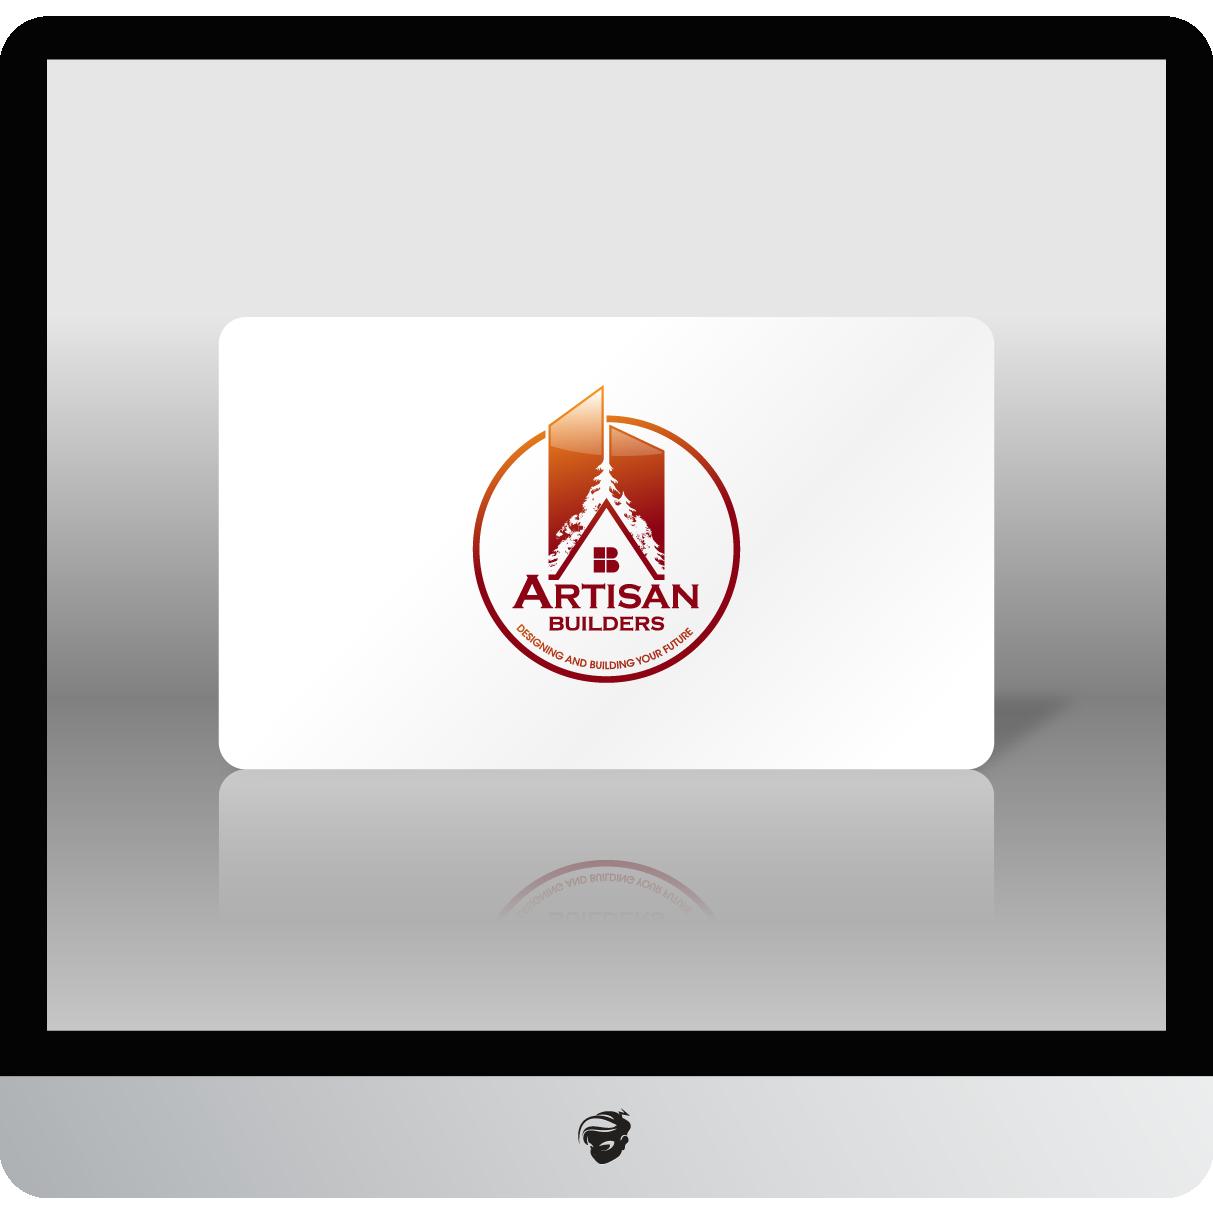 Logo Design by zesthar - Entry No. 224 in the Logo Design Contest Captivating Logo Design for Artisan Builders.